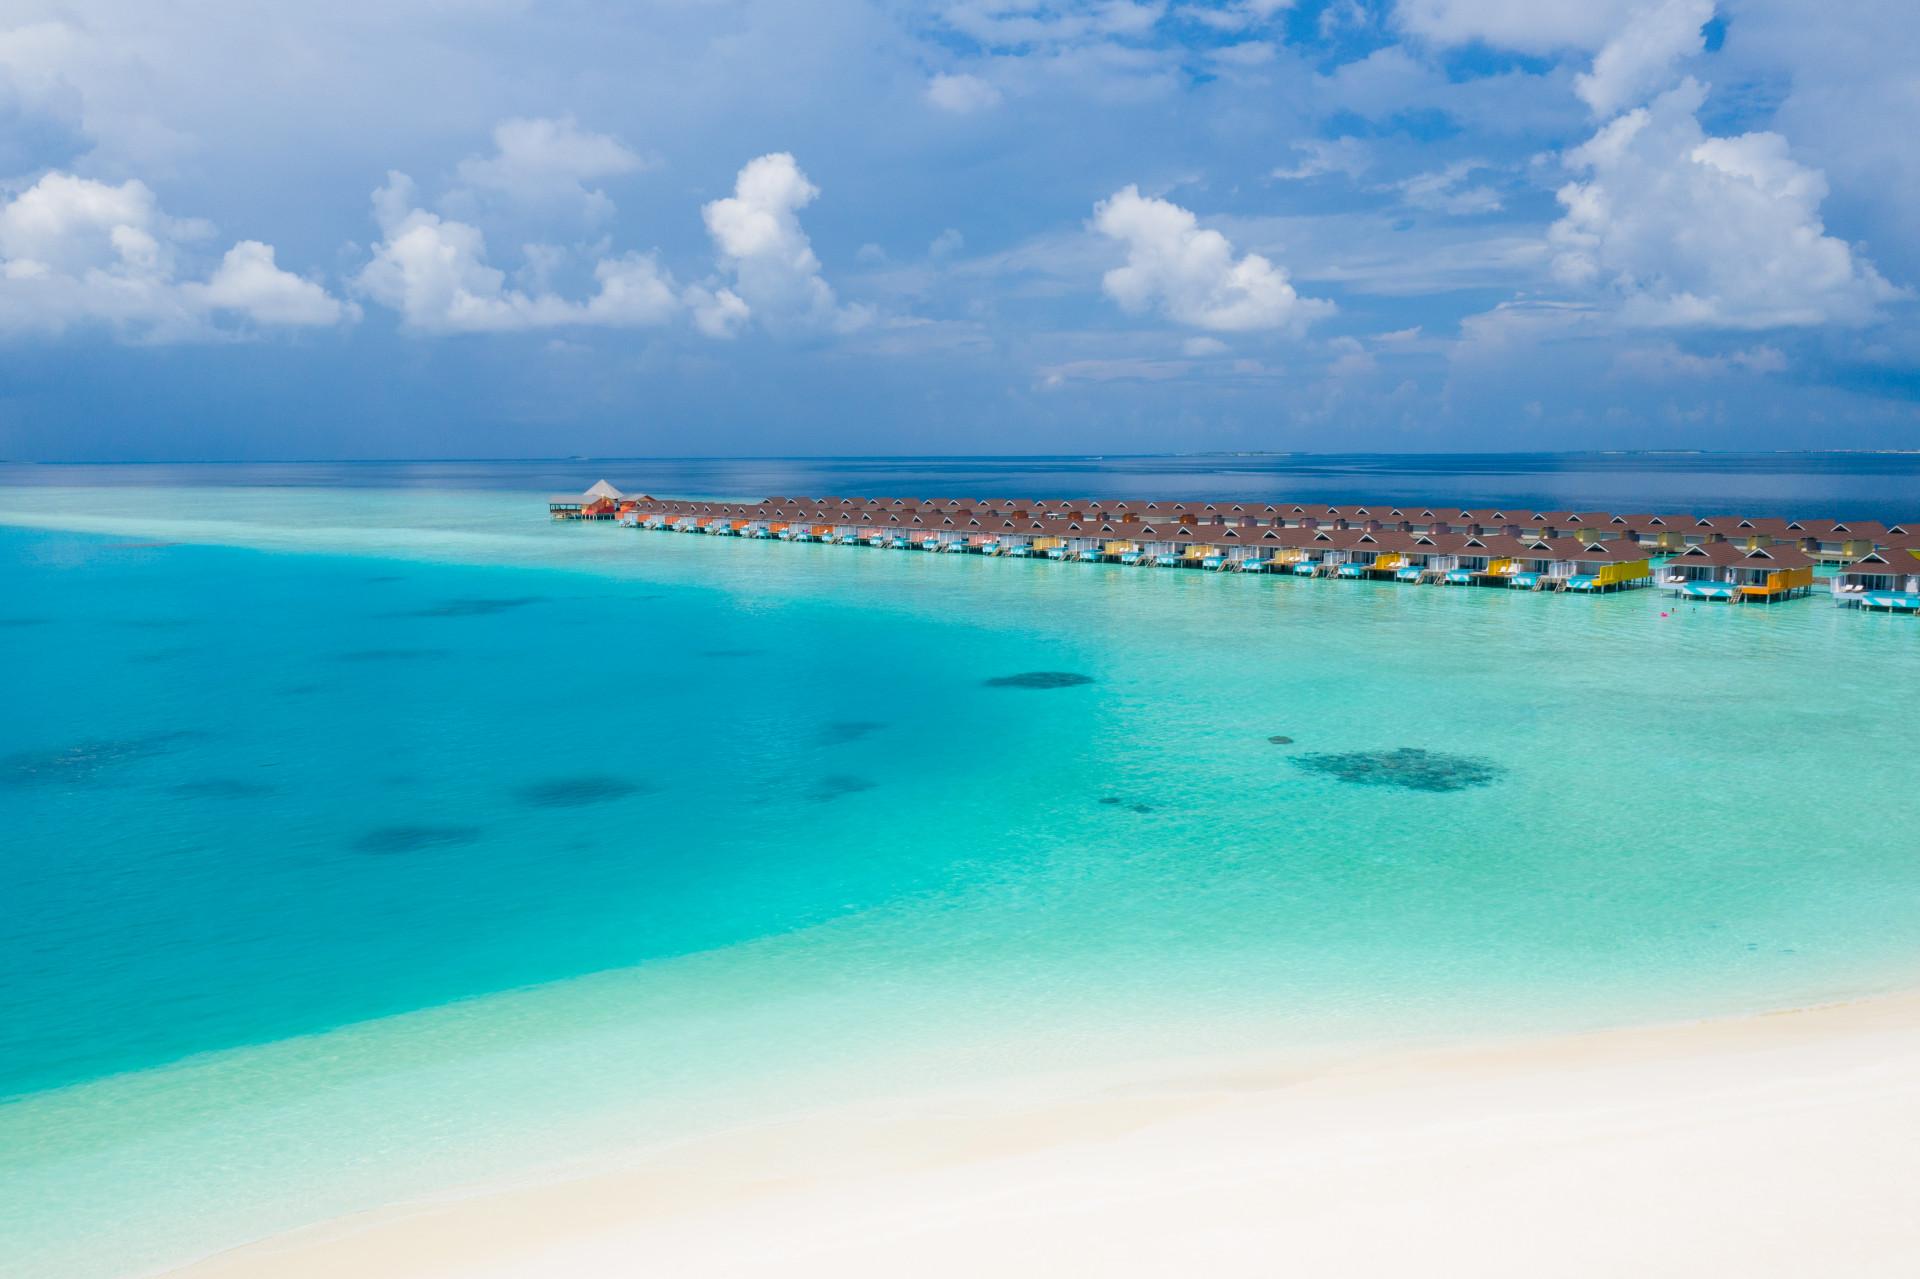 The Standard, Hurulvalhi Maldives